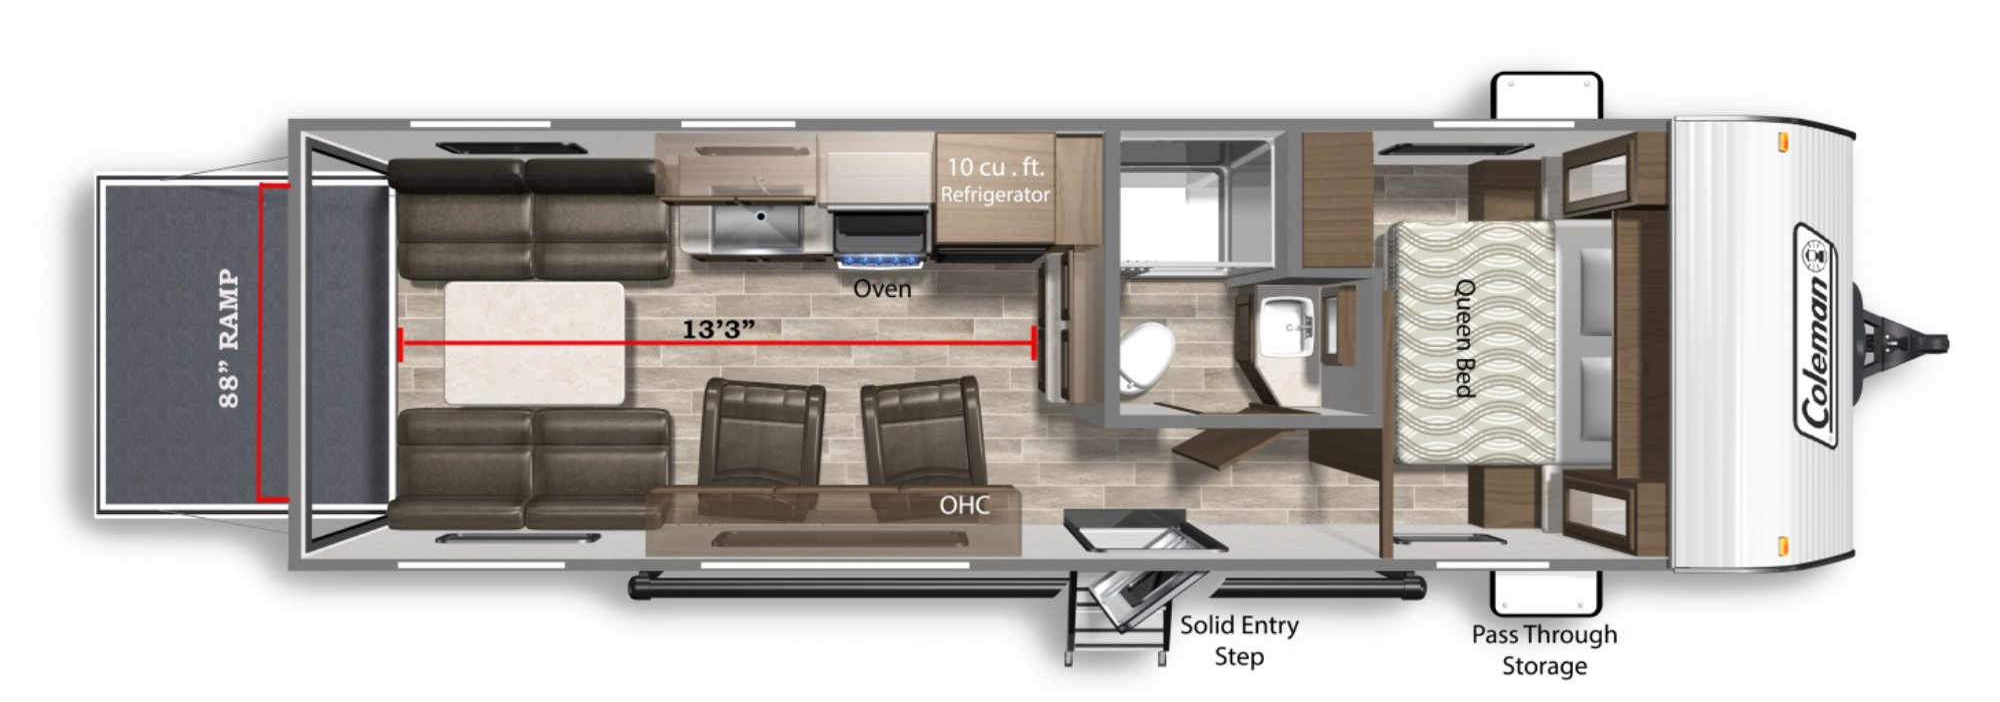 View Floor Plan for 2022 COLEMAN COLEMAN LANTERN 251TQ